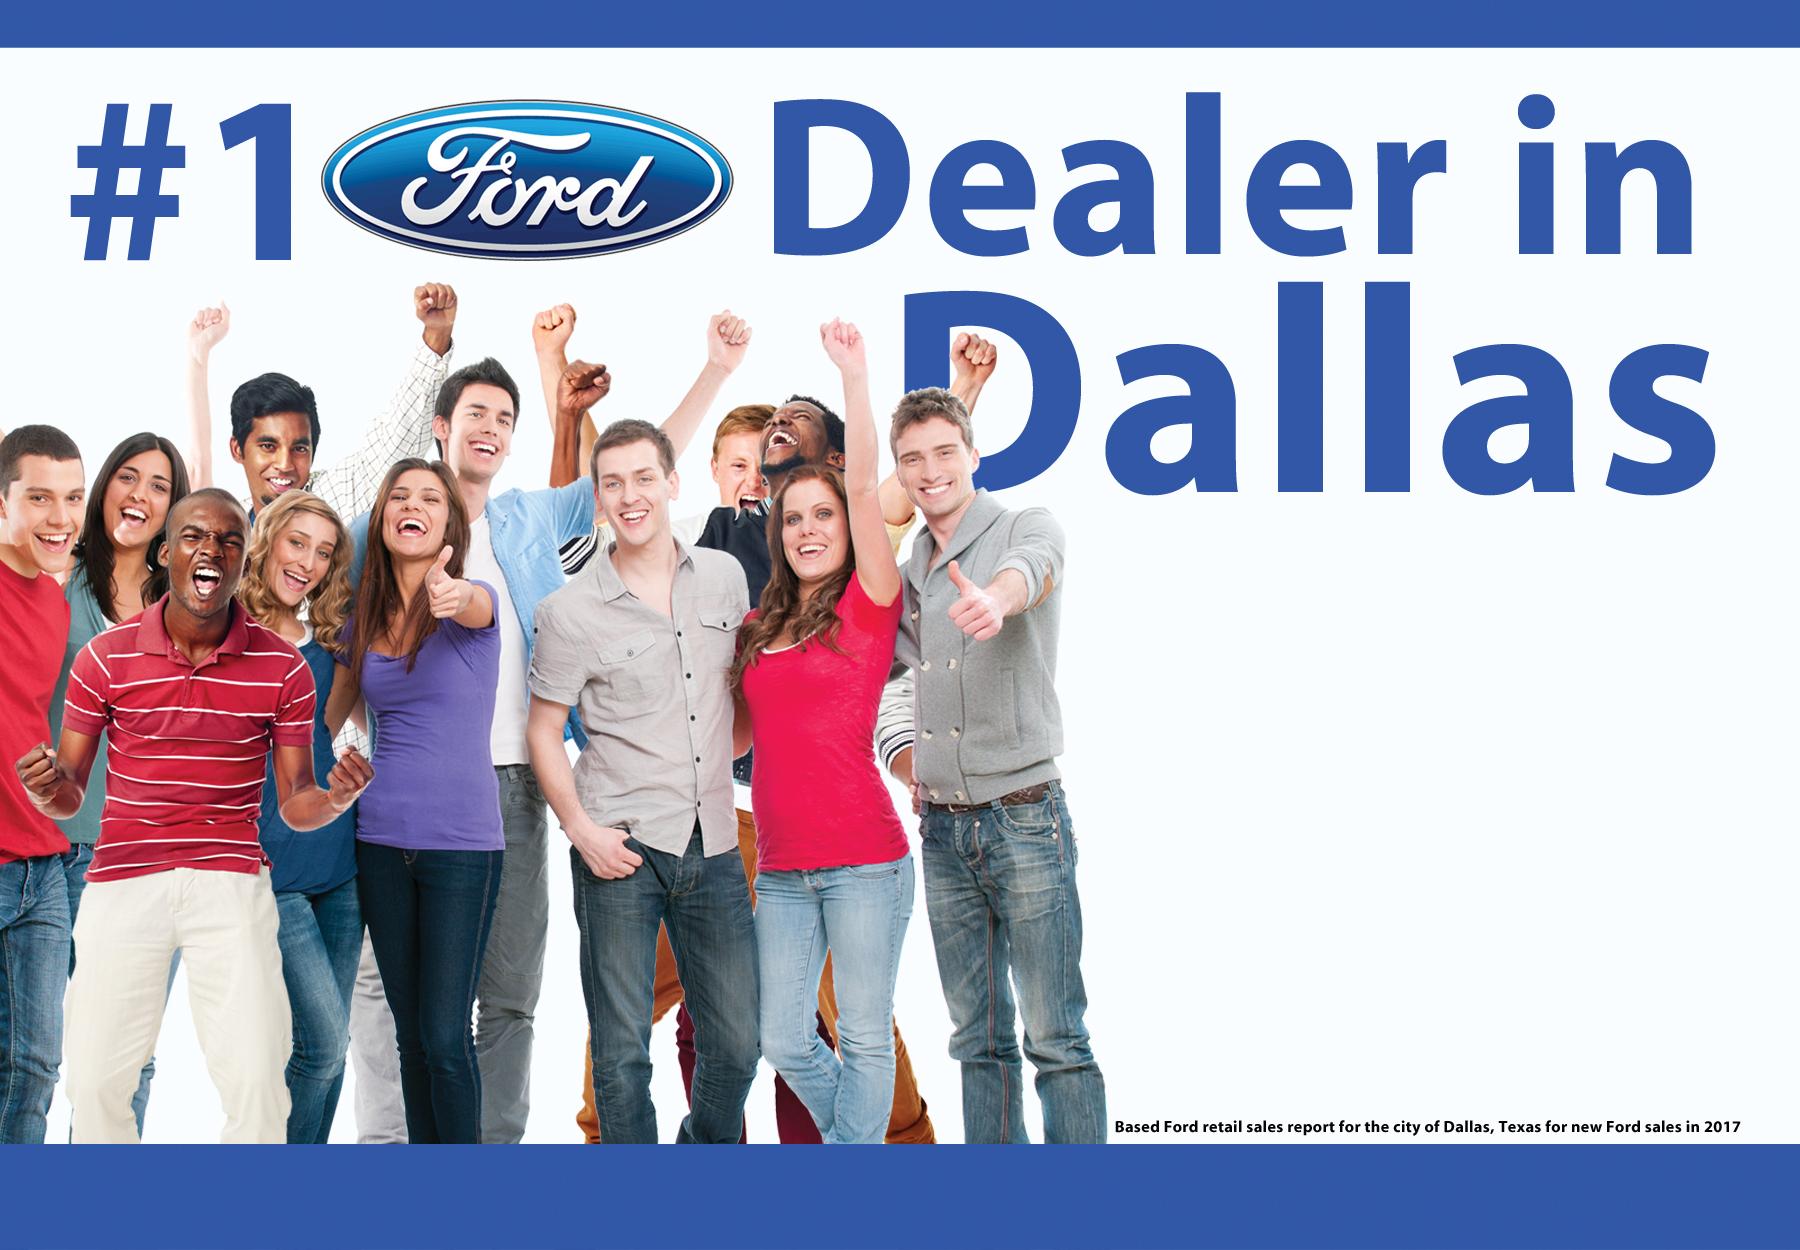 #1 Ford Dealer in Dallas